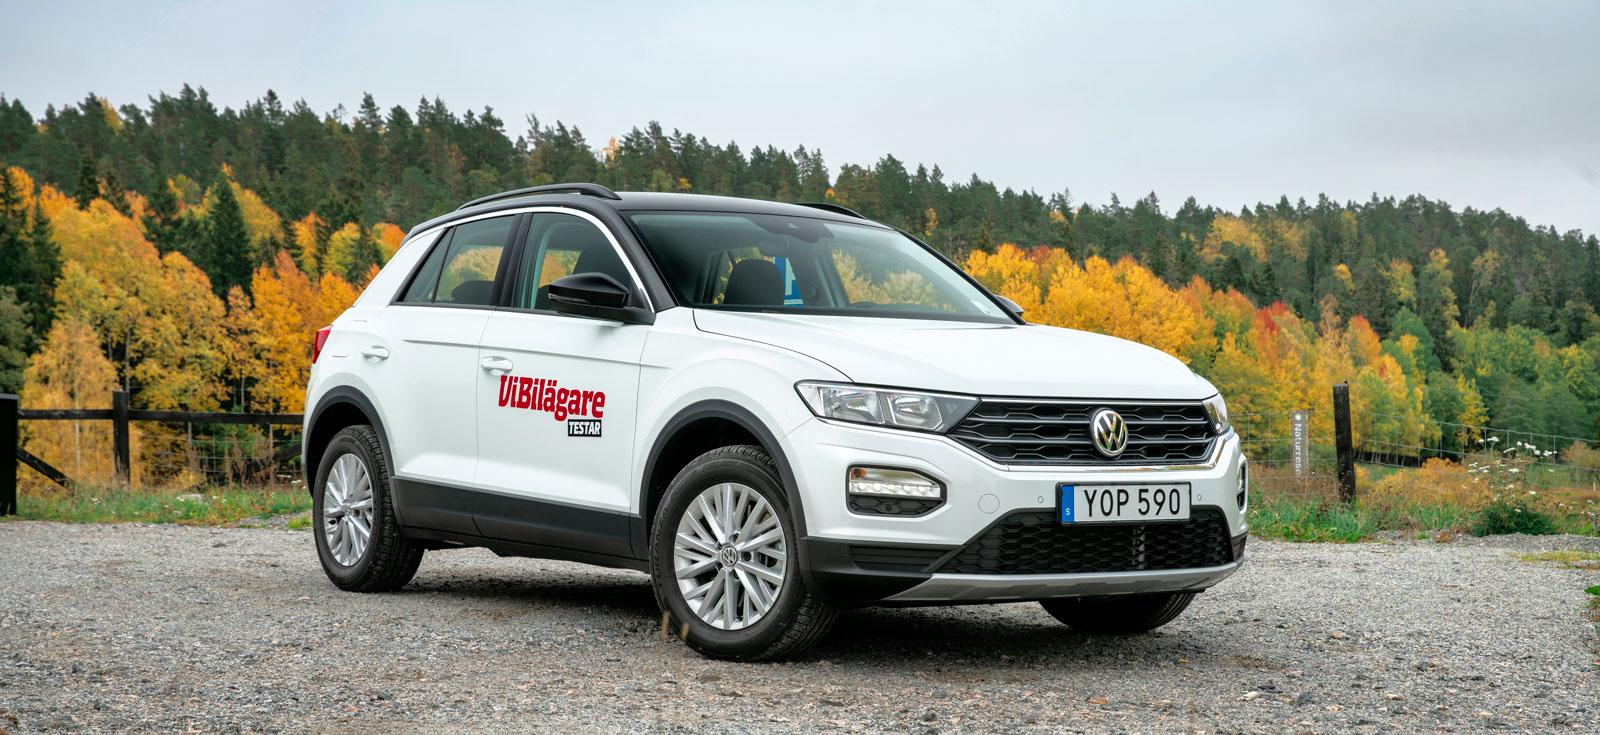 Volkswagen T-Roc 1.0 TSI/115 hk Grundpris:219900 kr